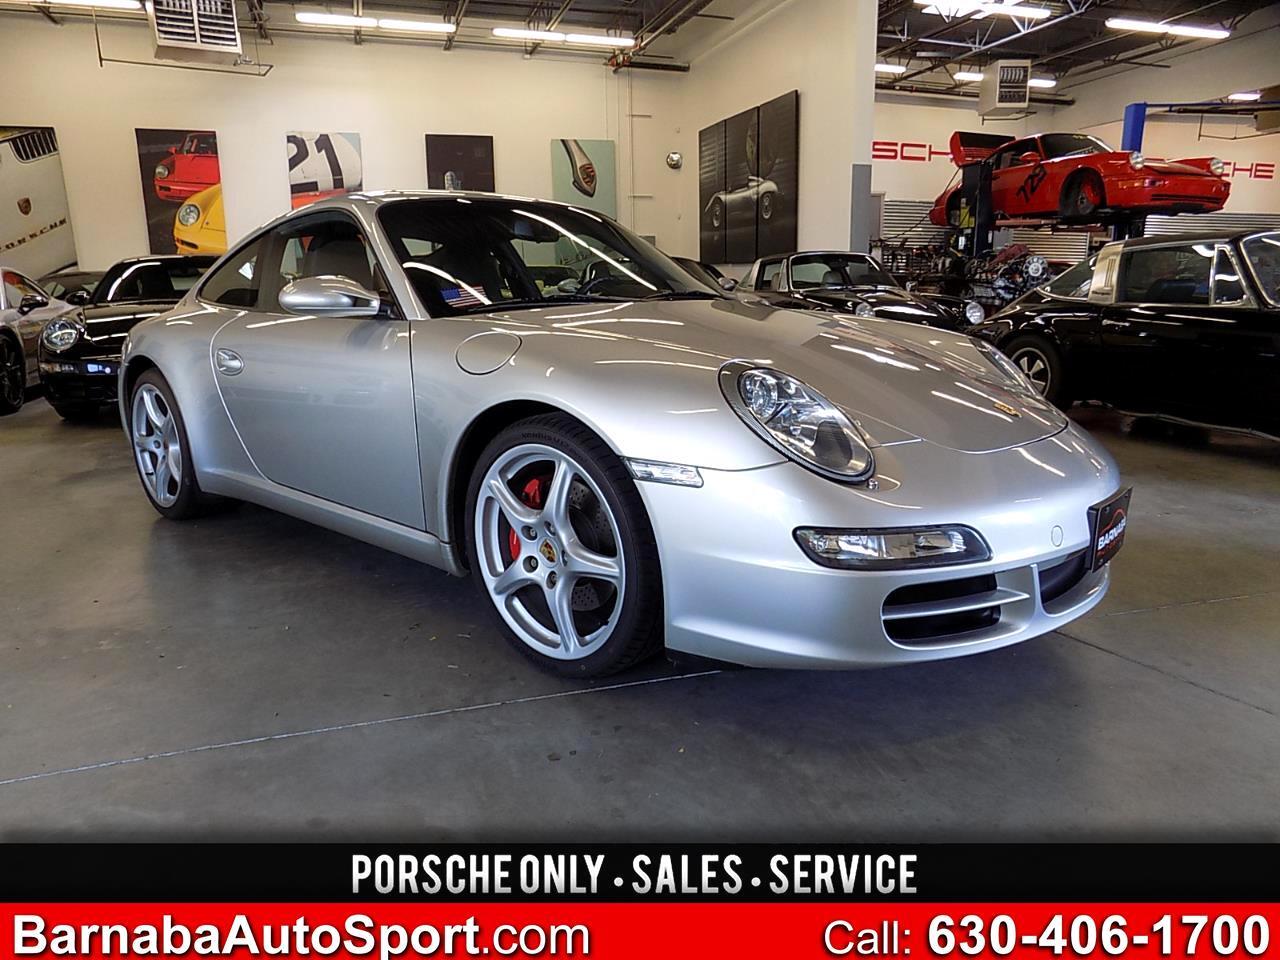 Porsche 911 Carrera S 2005